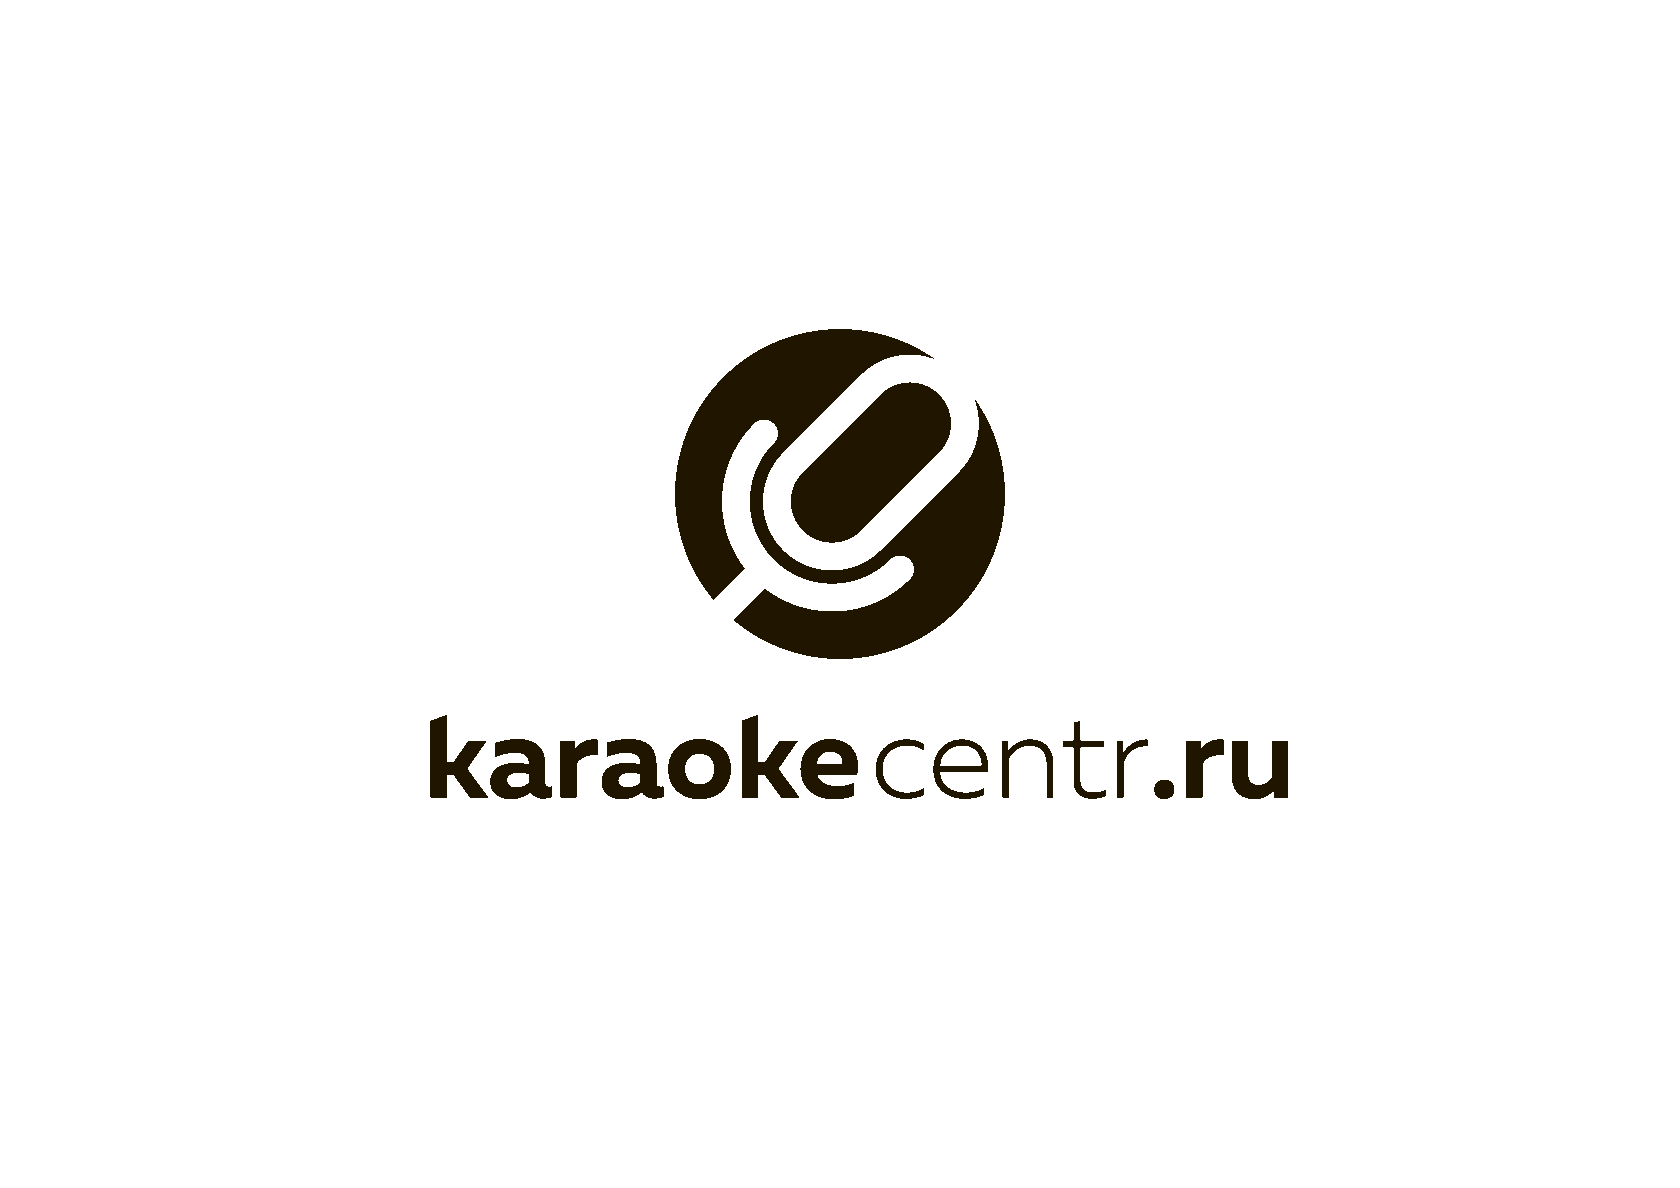 Karaoke Centr